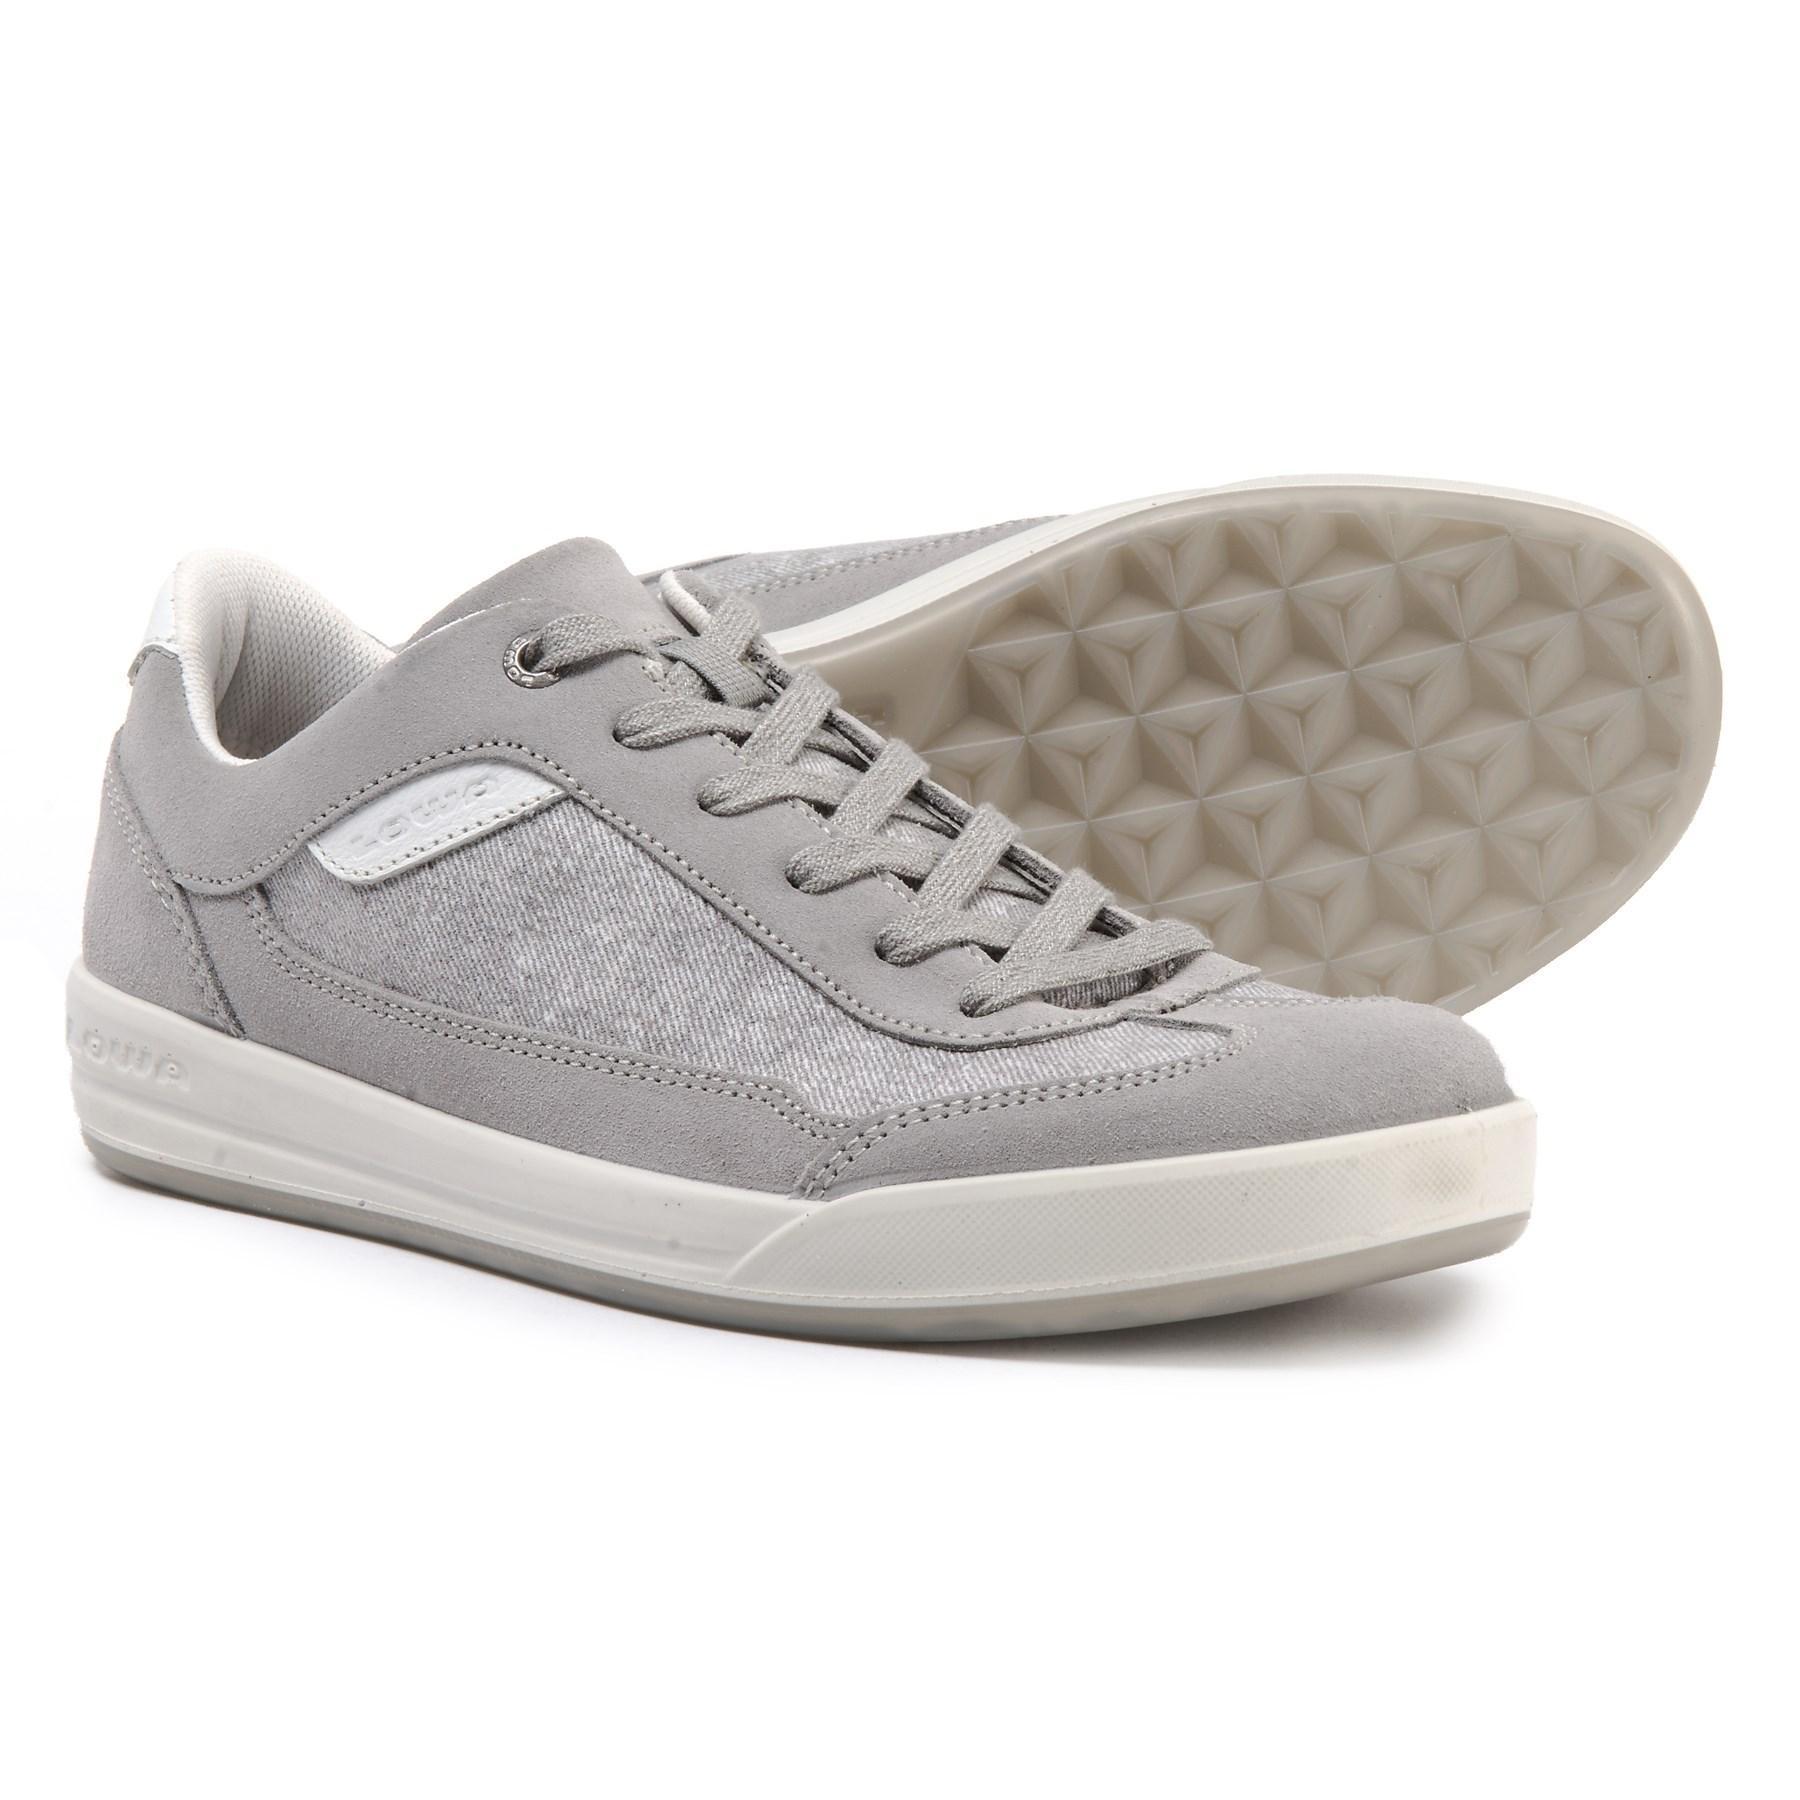 Almada Low Sneakers (for Women)